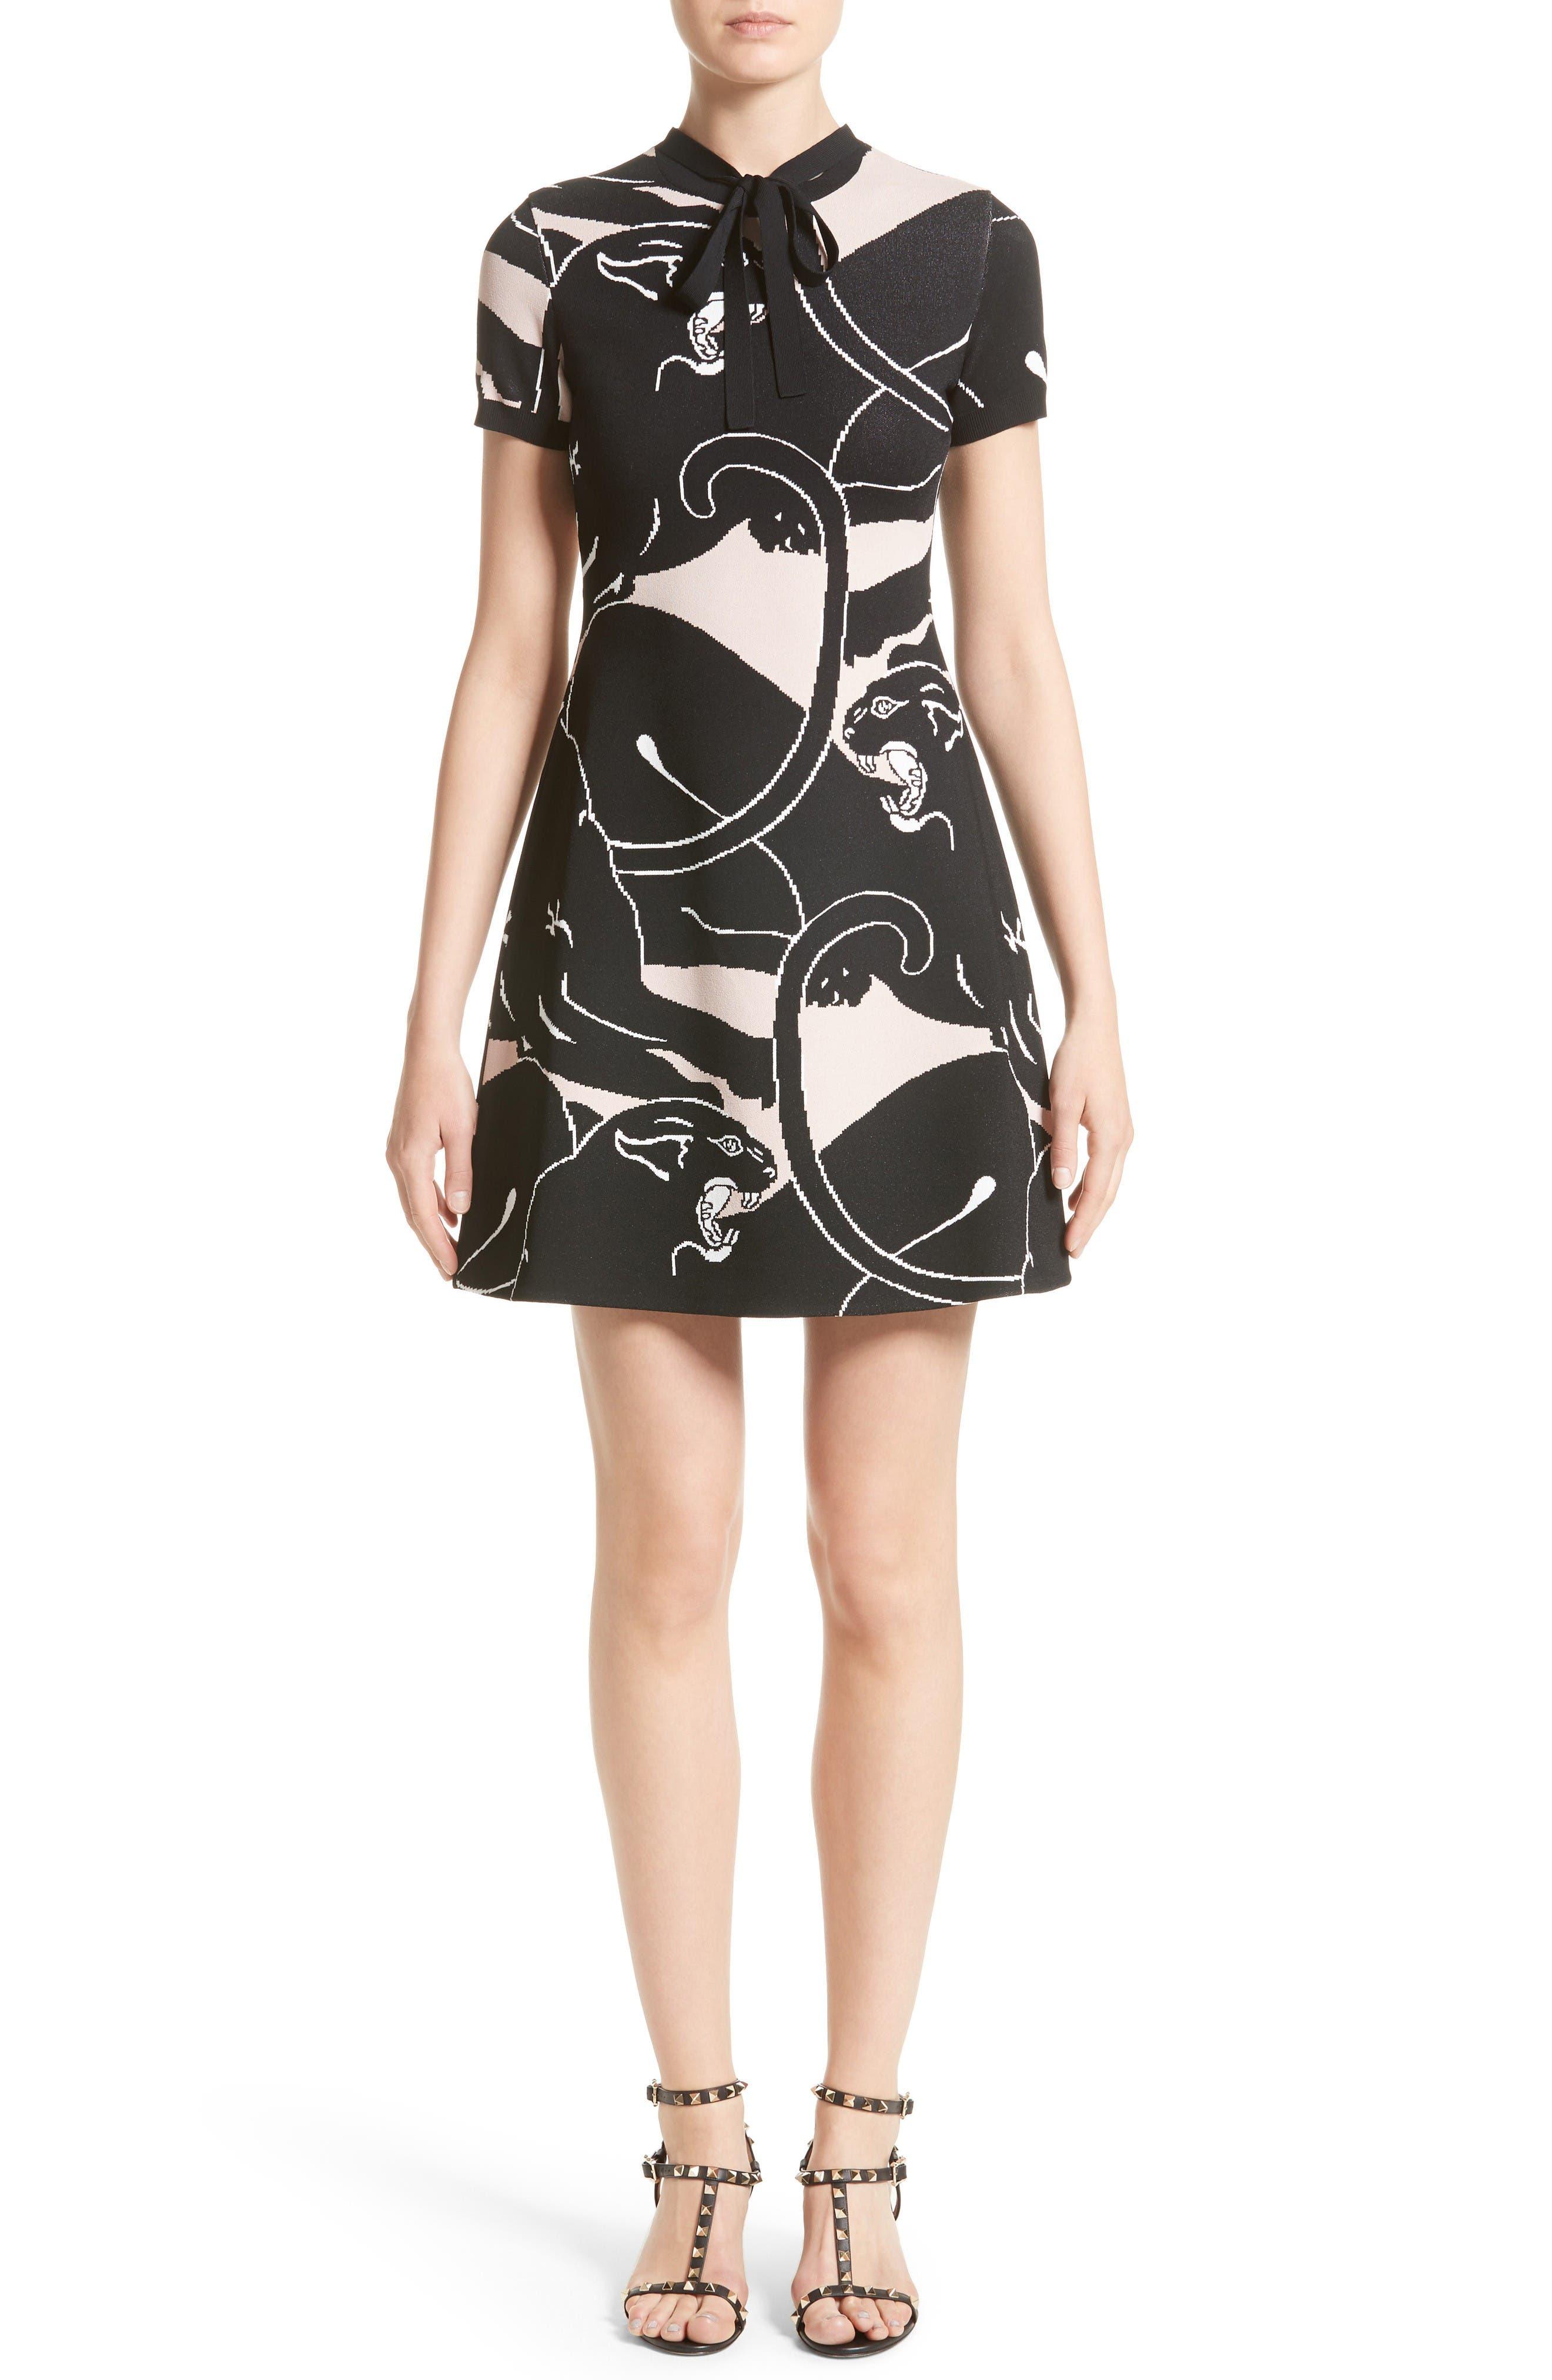 VALENTINO GARAVANI Valentino Jacquard Panther Print Dress